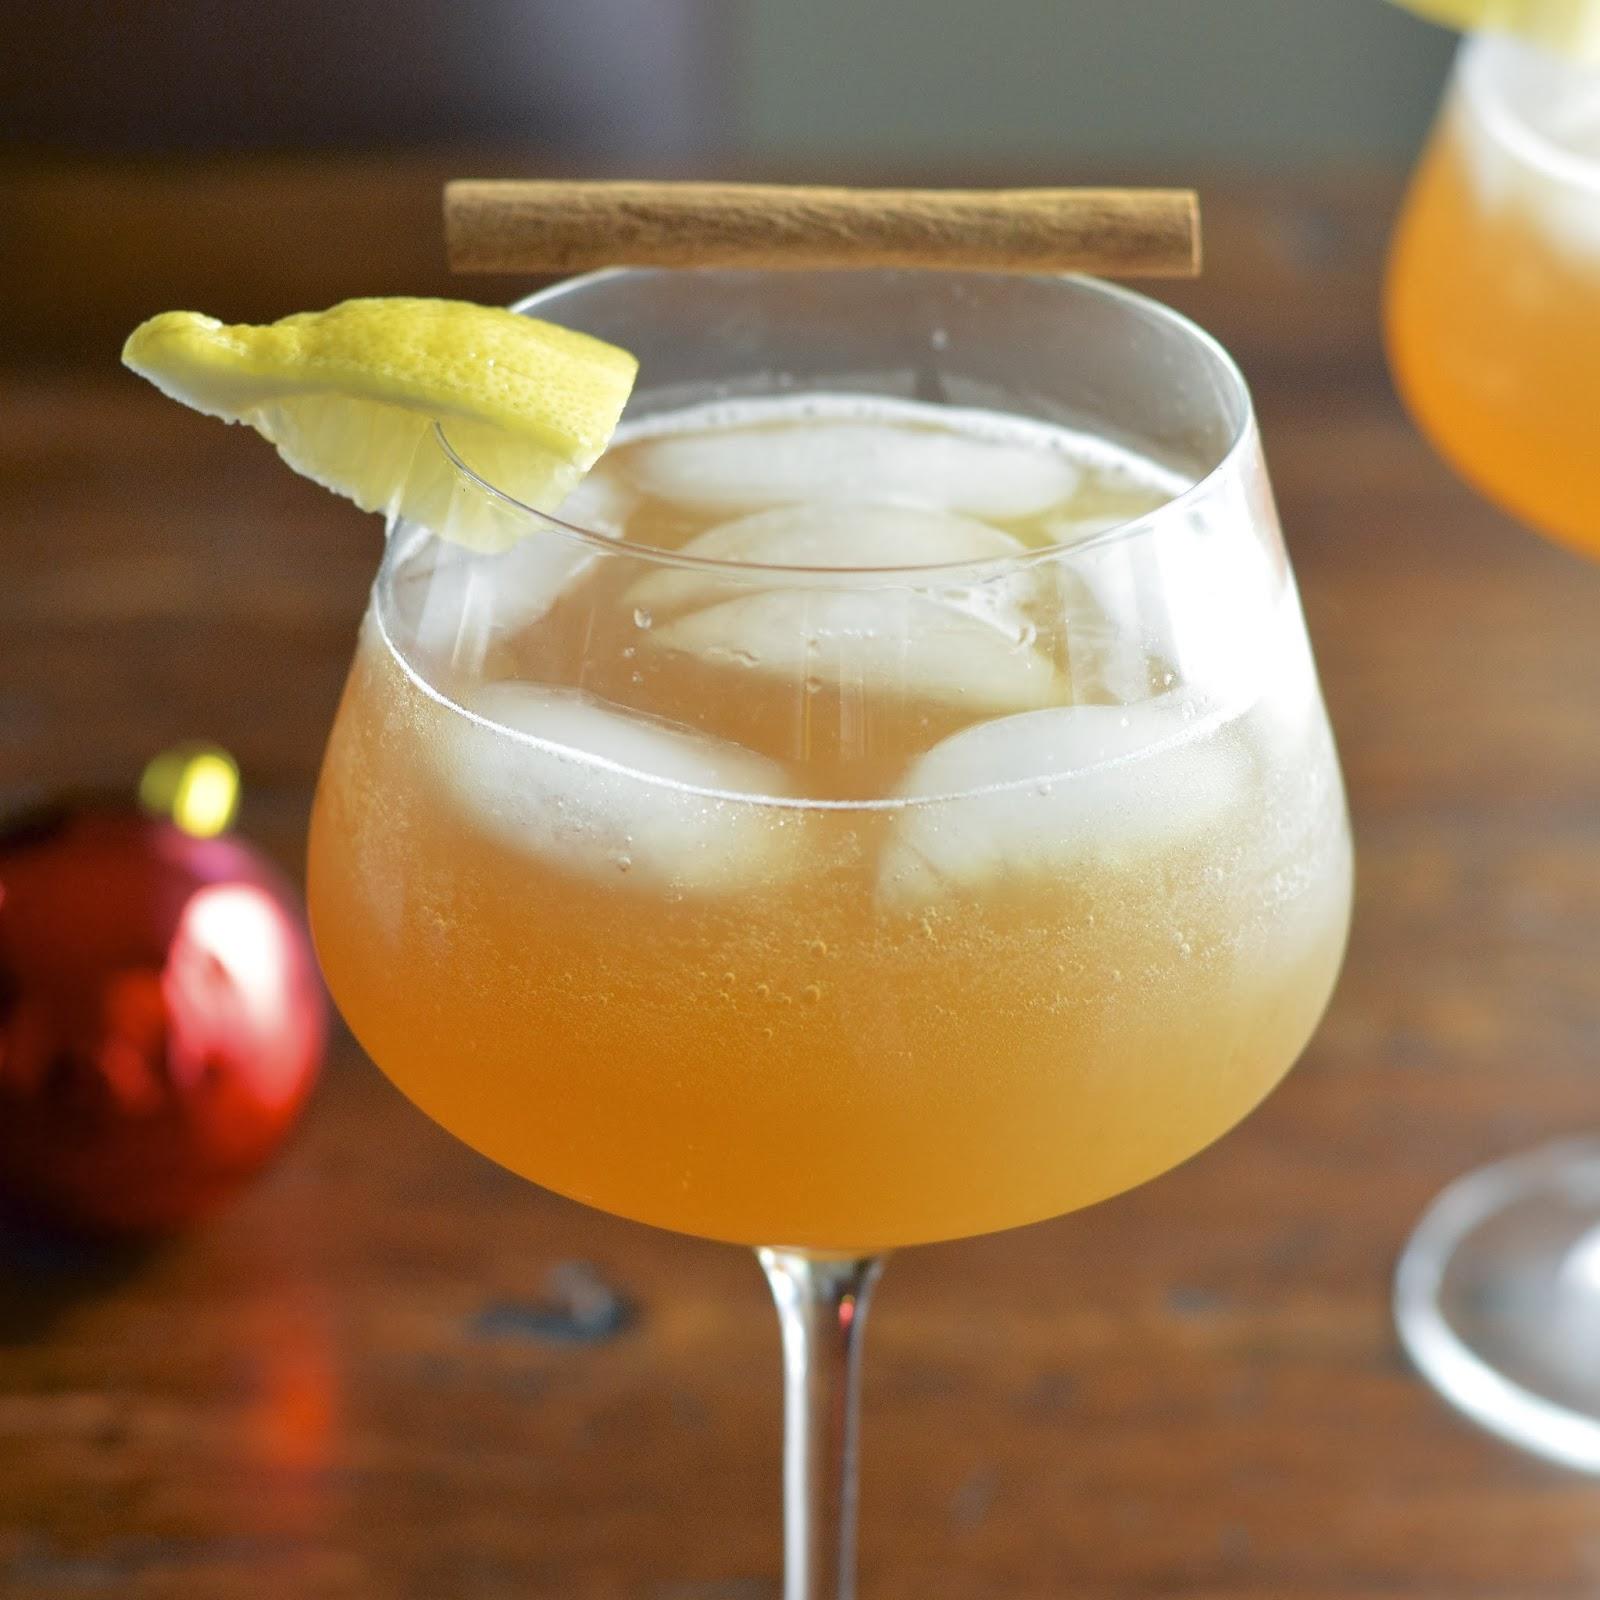 Sparkling Drinks Alcoholic: Sparkling Apple Cinnamon Cocktail